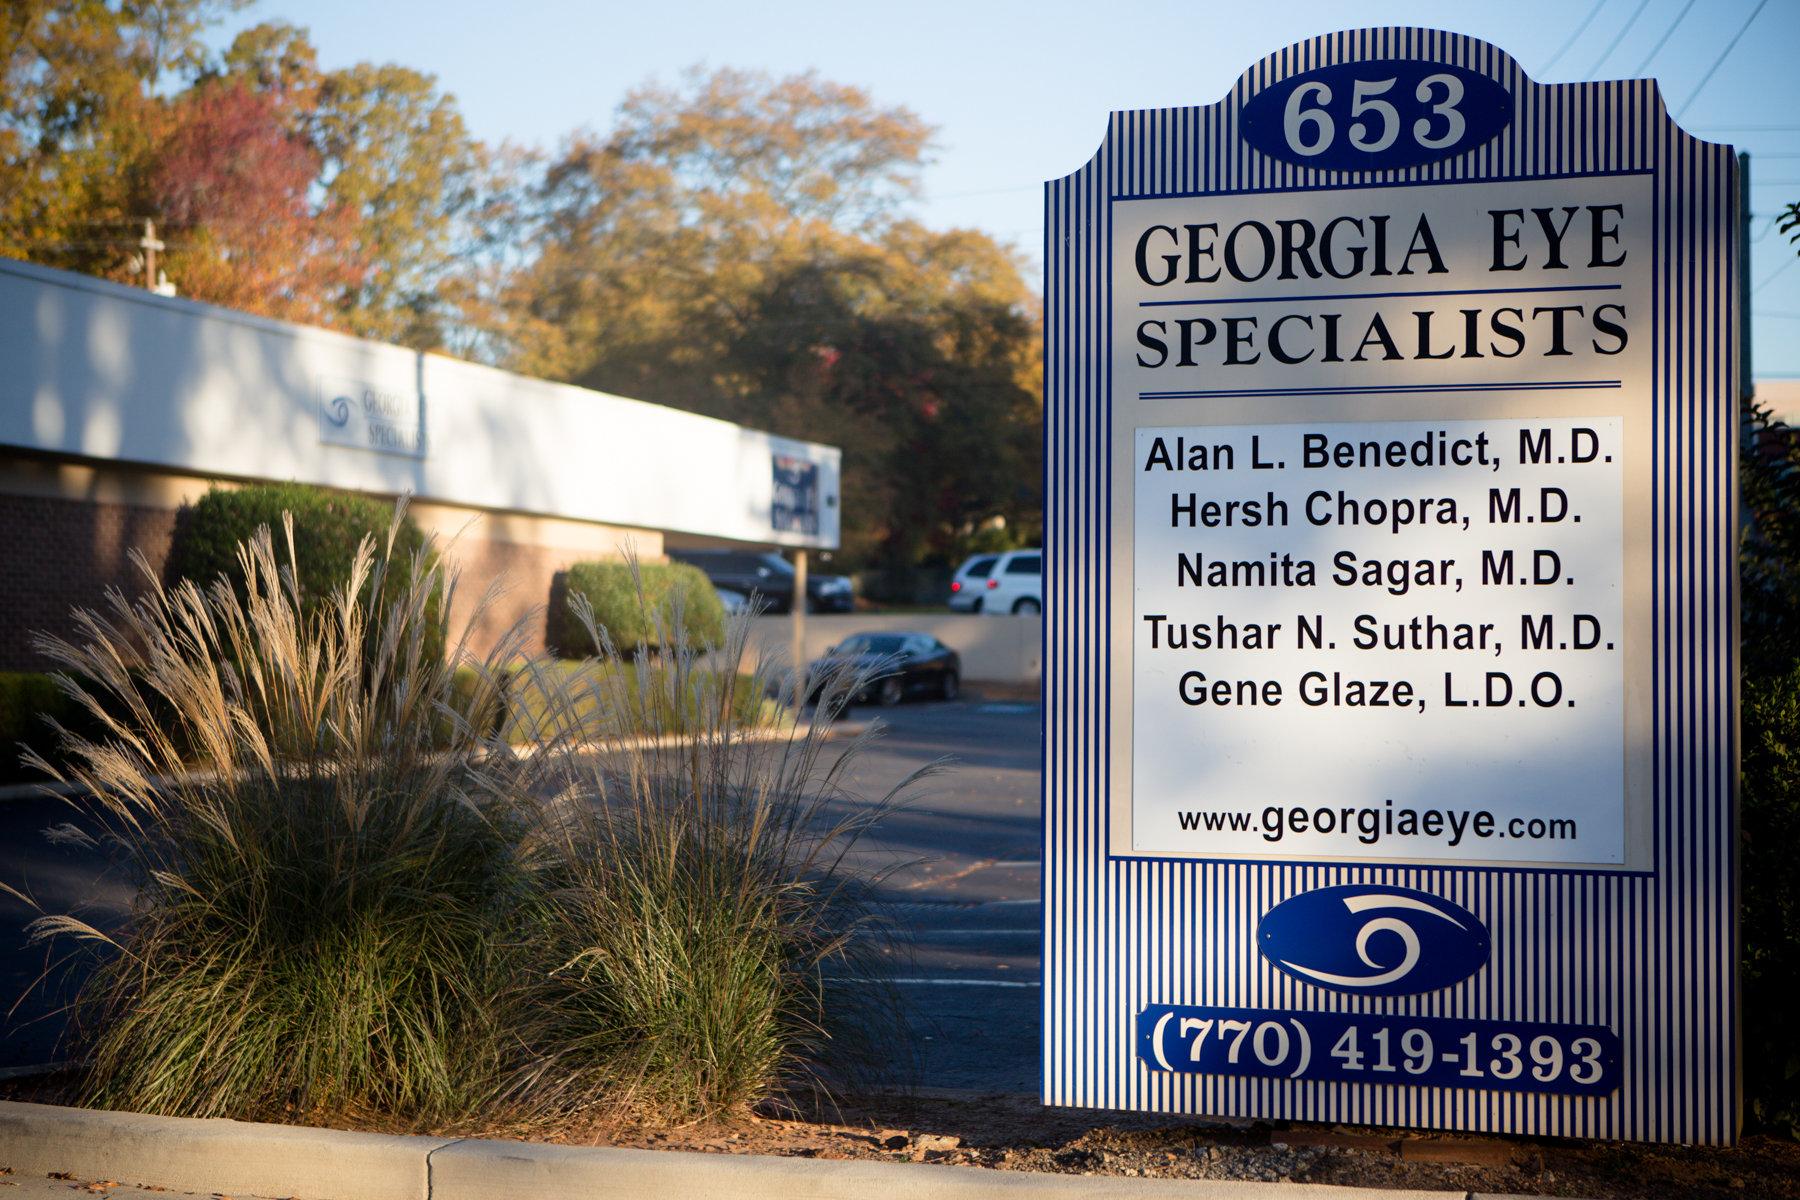 Georgia Eye Specialists | 653 Cherokee Street | Marietta, GA 30060